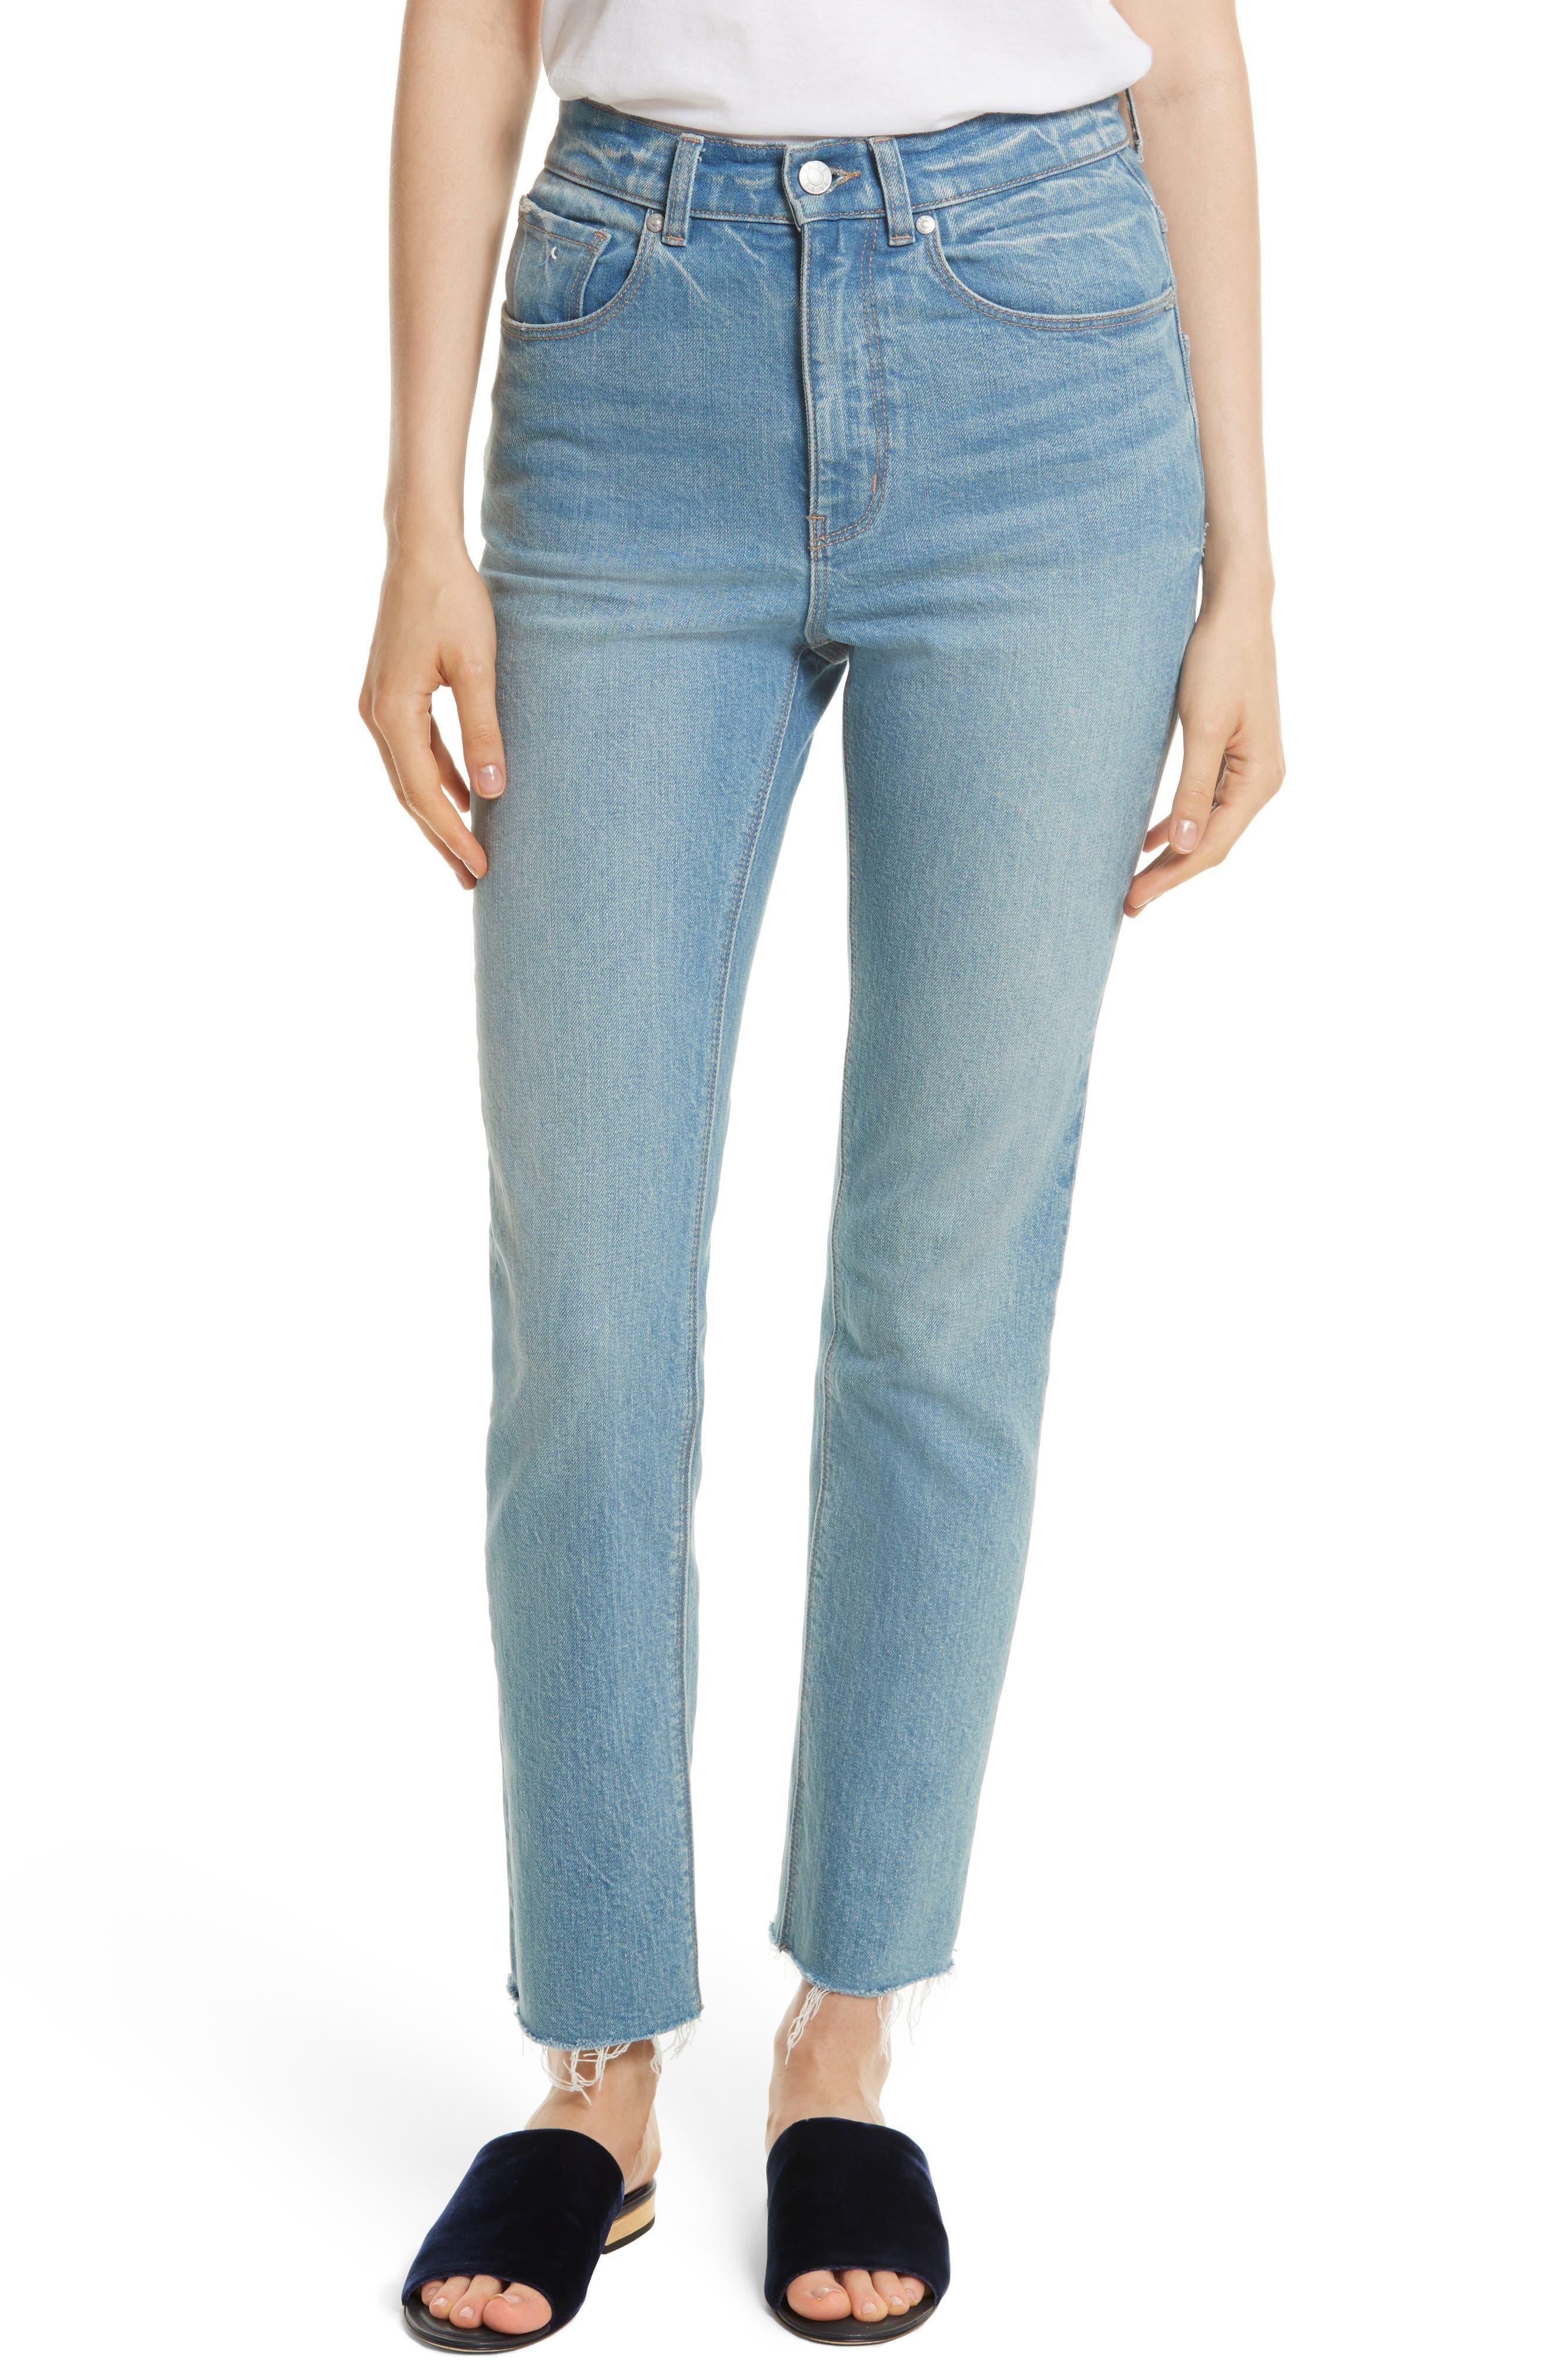 LA VIE REBECCA TAYLOR Ines High Waist Ankle Jeans